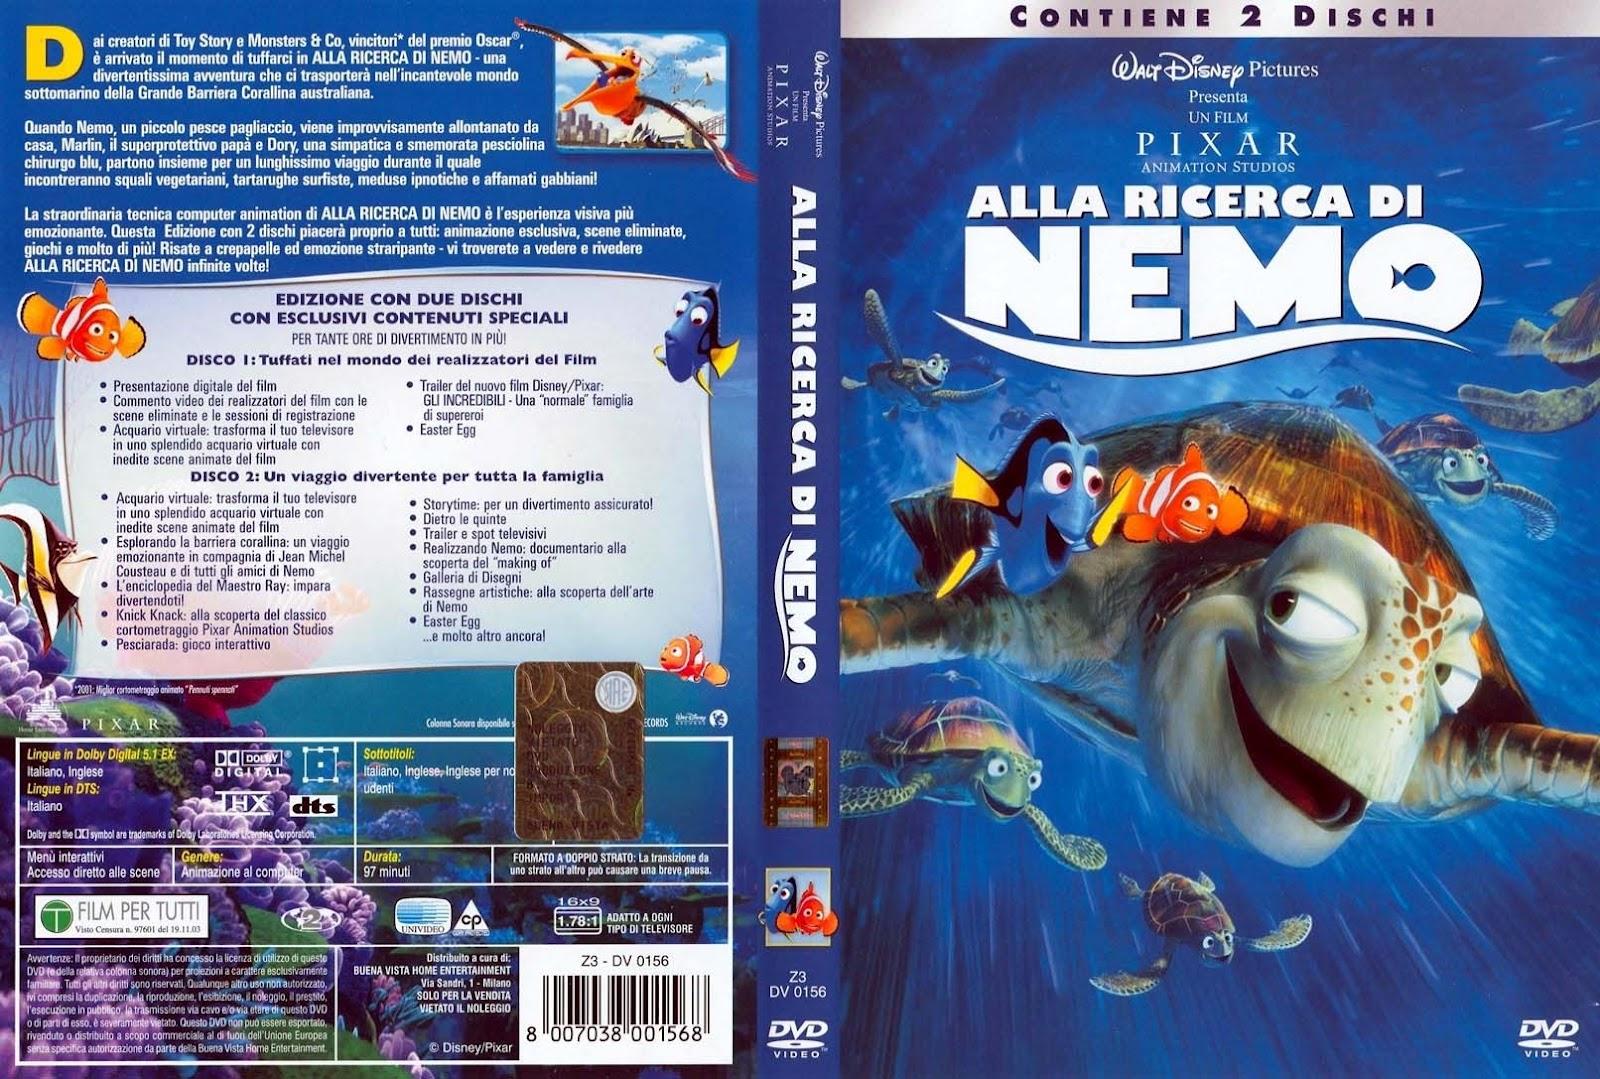 http://2.bp.blogspot.com/-DDCAPG8Lb0I/UHAmR9WWeRI/AAAAAAAAAoM/CzSX4yRMZTo/s1600/Alla_ricerca_di_Nemo.jpg